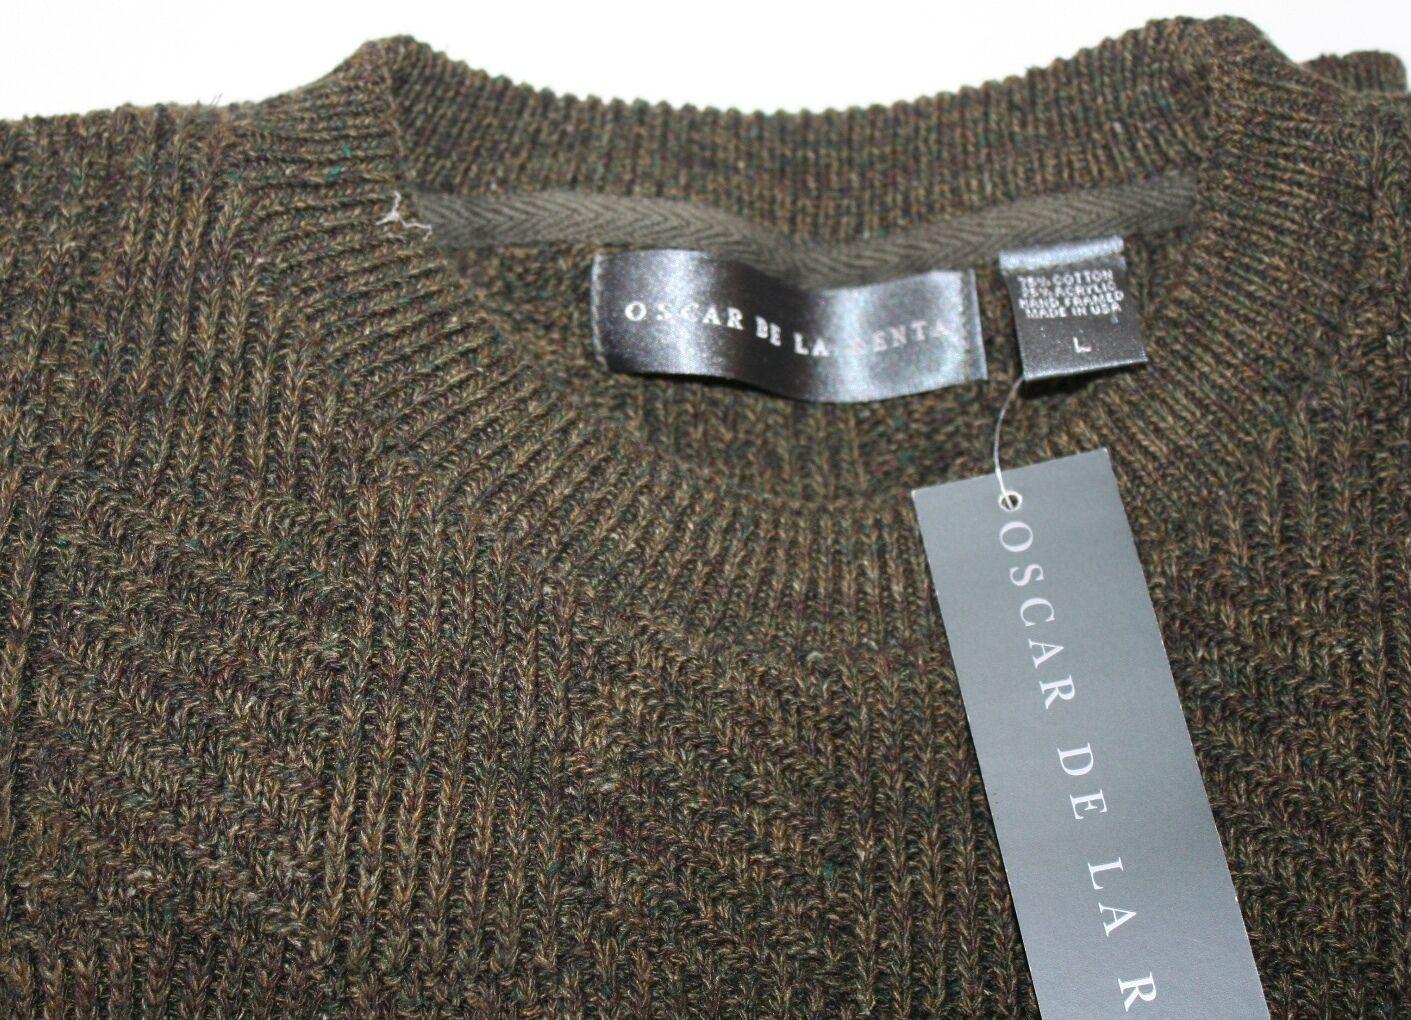 Oscar de la Renta Mens Knit Sweater Large Olive Grün Made USA Cotton NWT